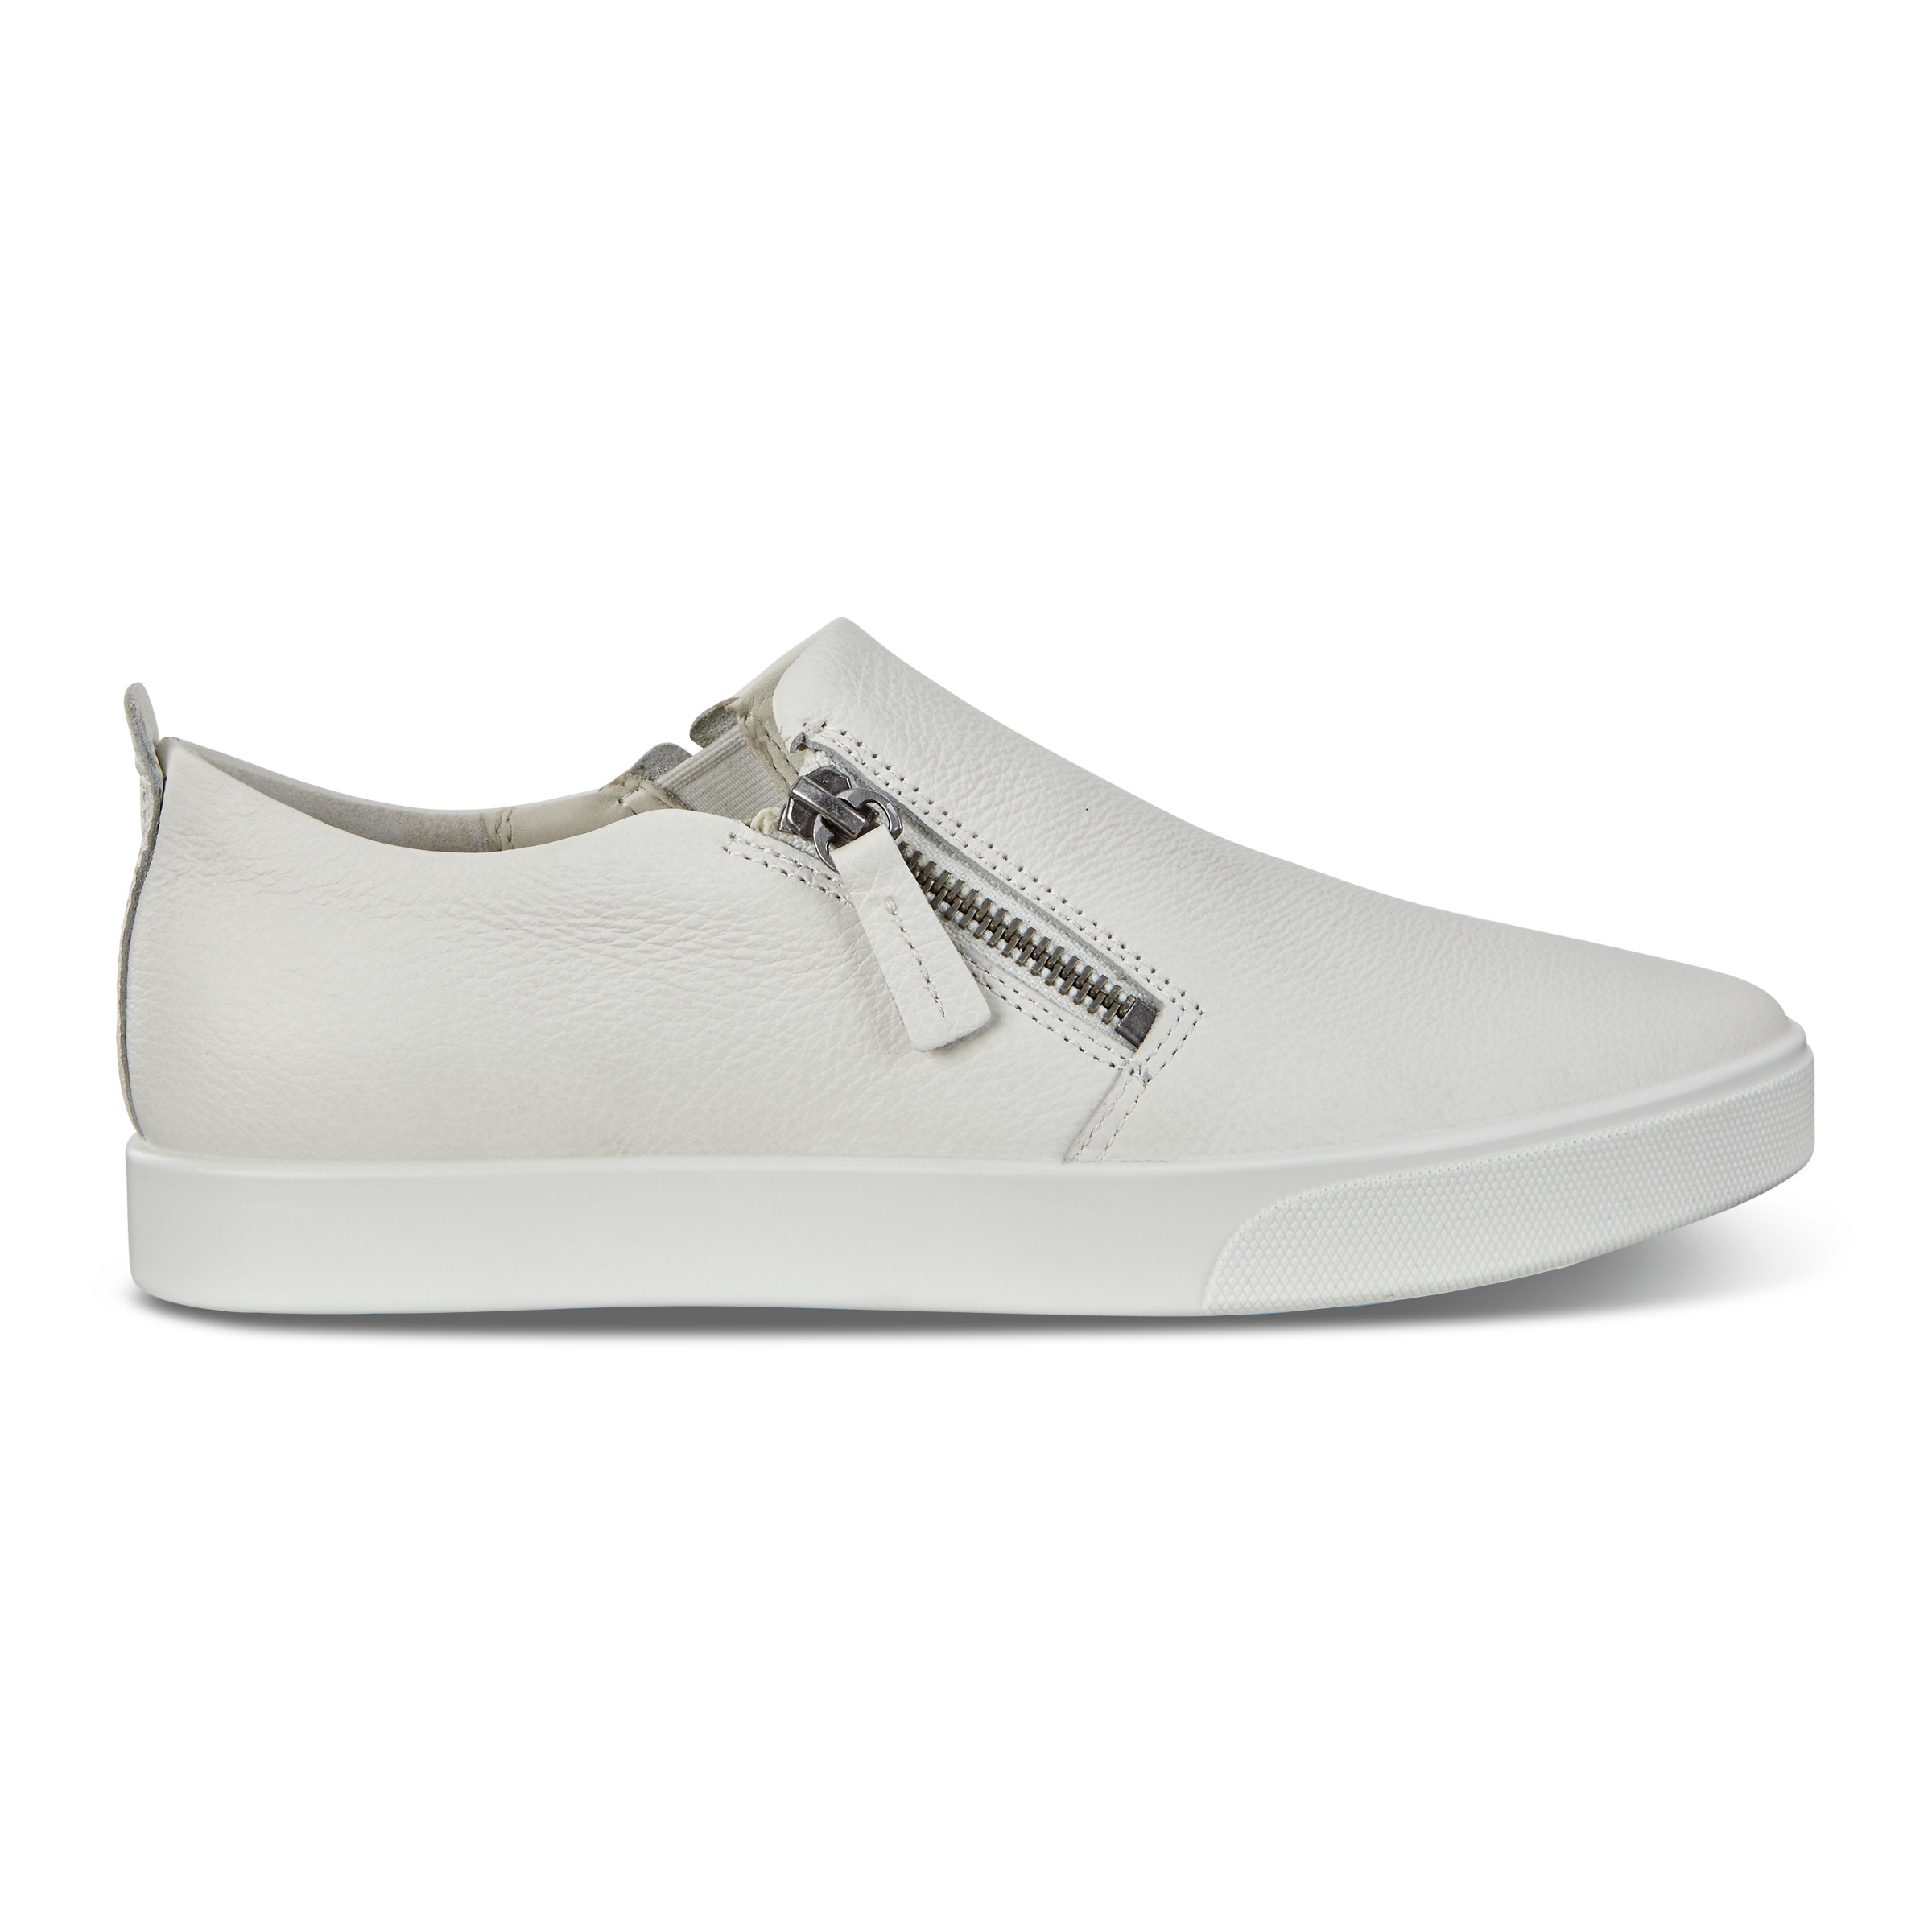 ECCO Gillian Shoe Sneakers Size 10-10.5 White